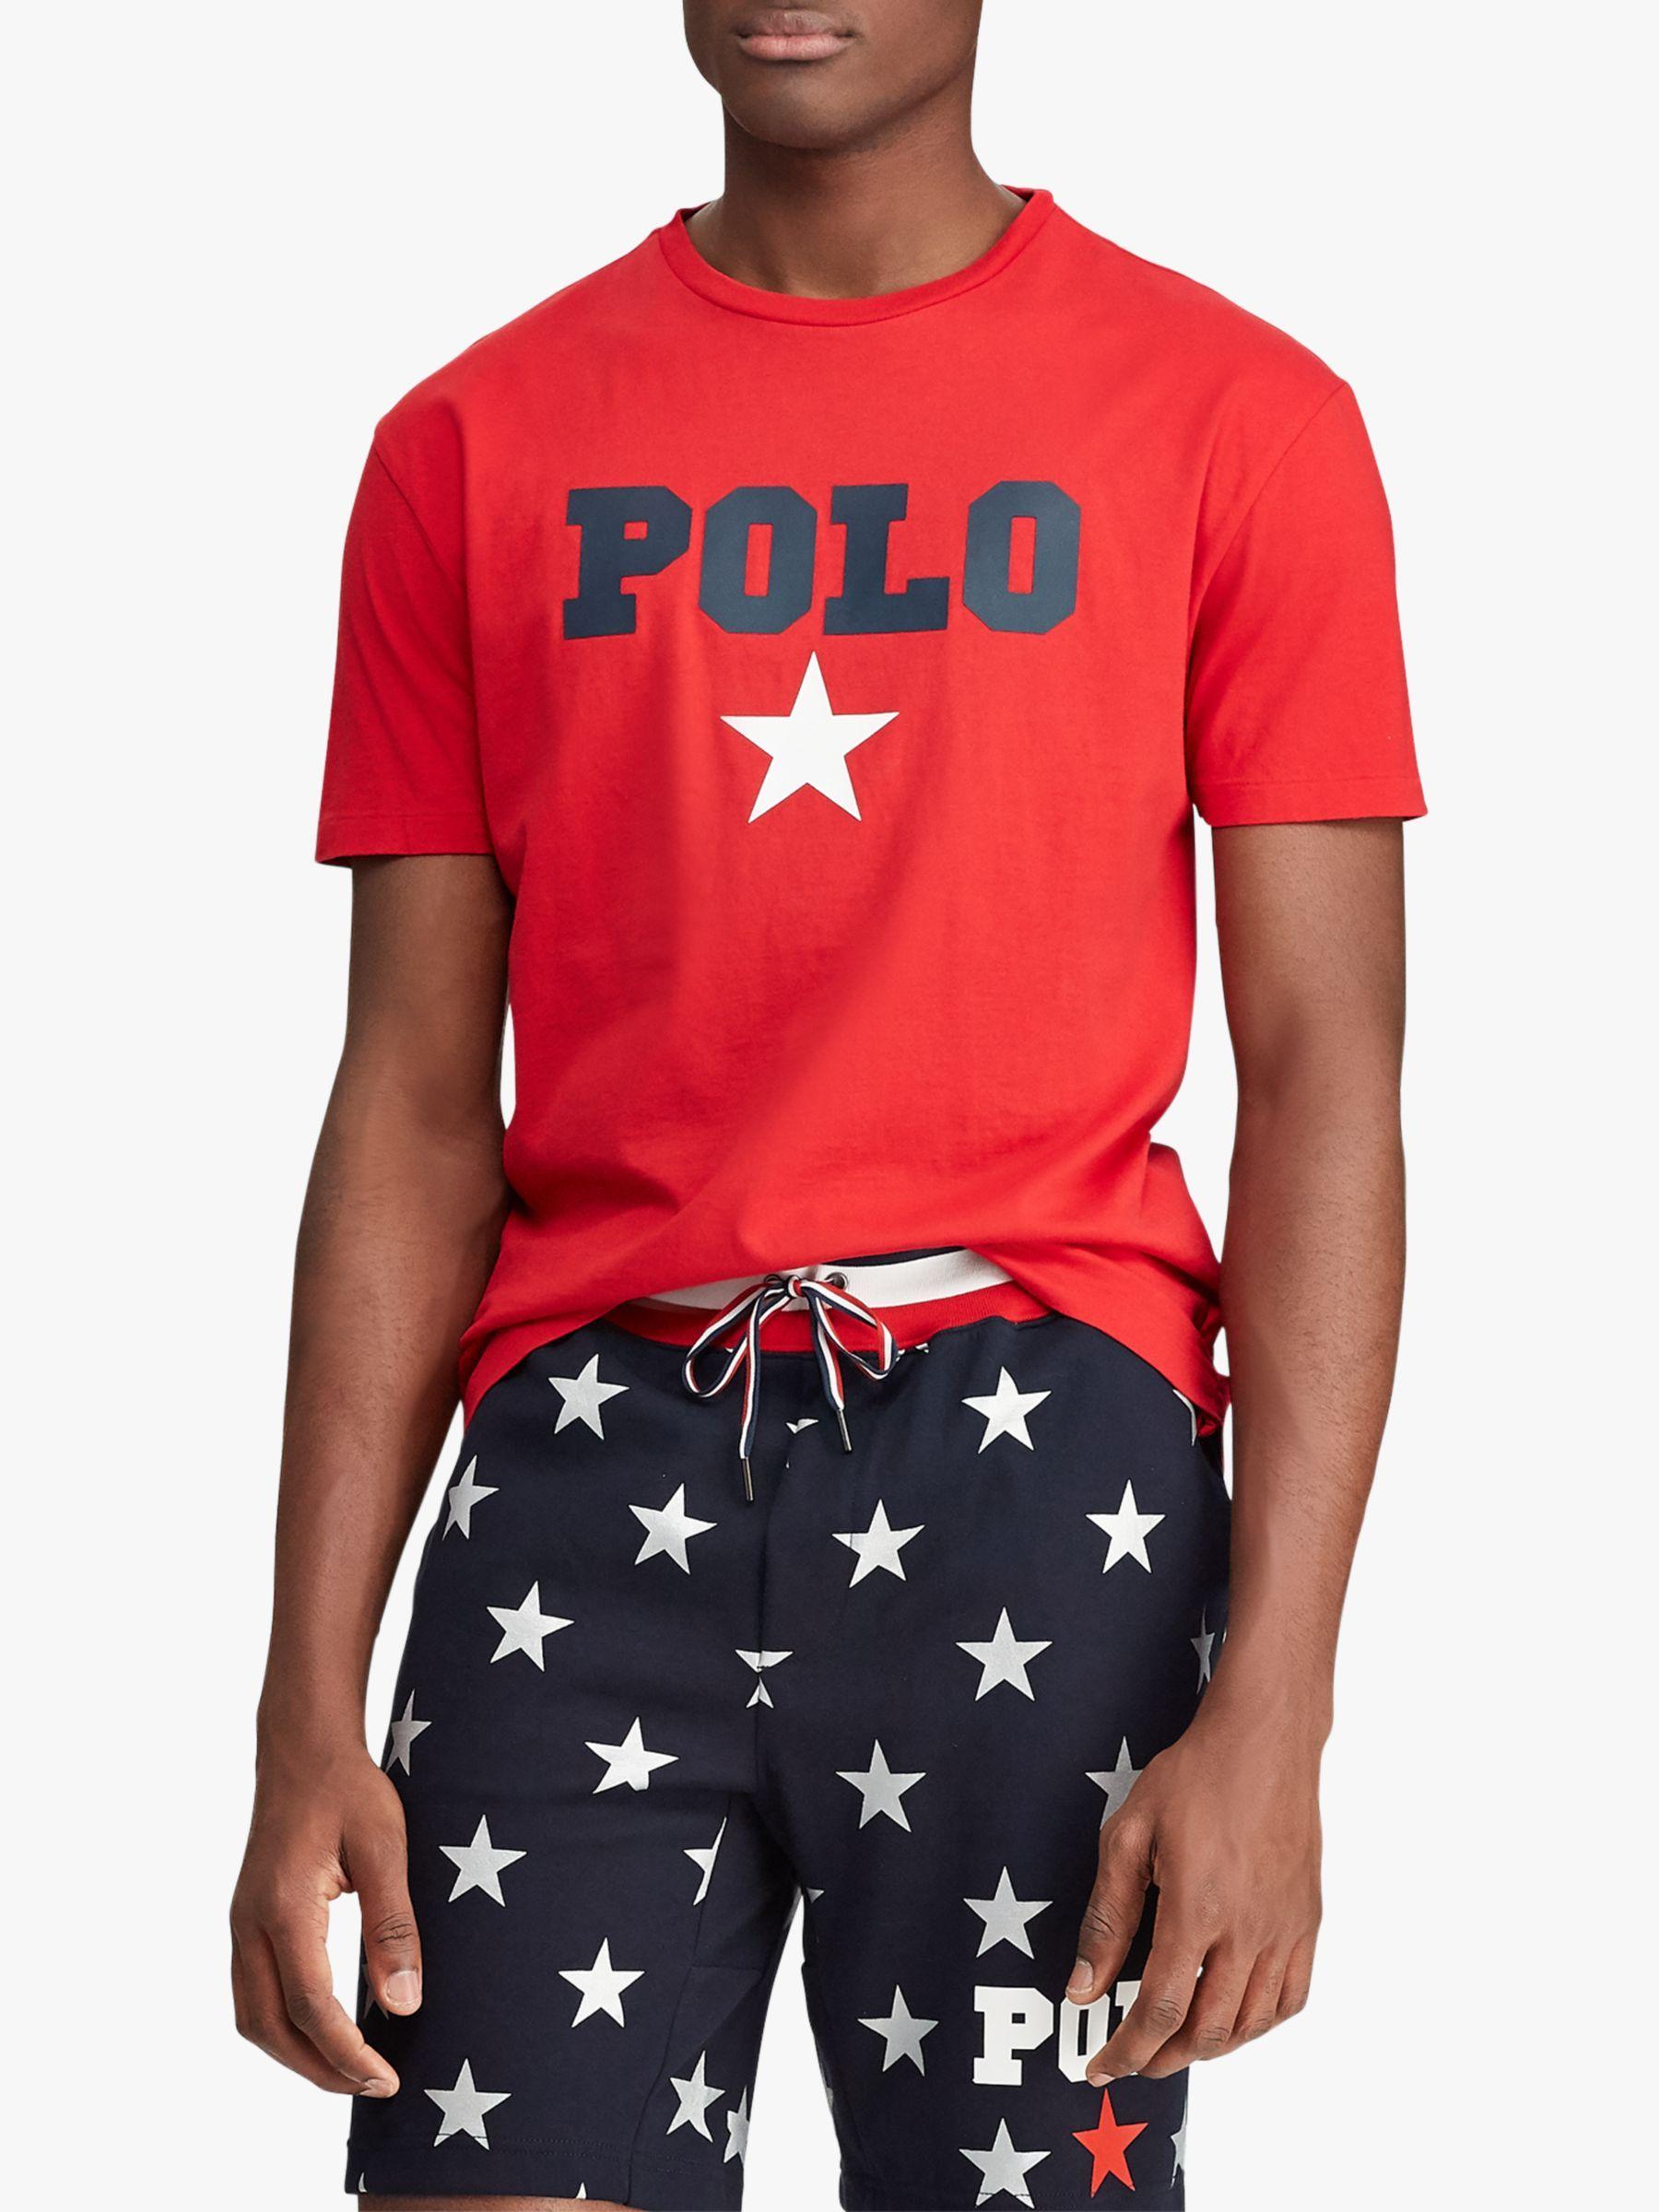 POLO Ralph Lauren Performance Mens Big Pony Shirt Big and Tall RL2000 RED//Navy